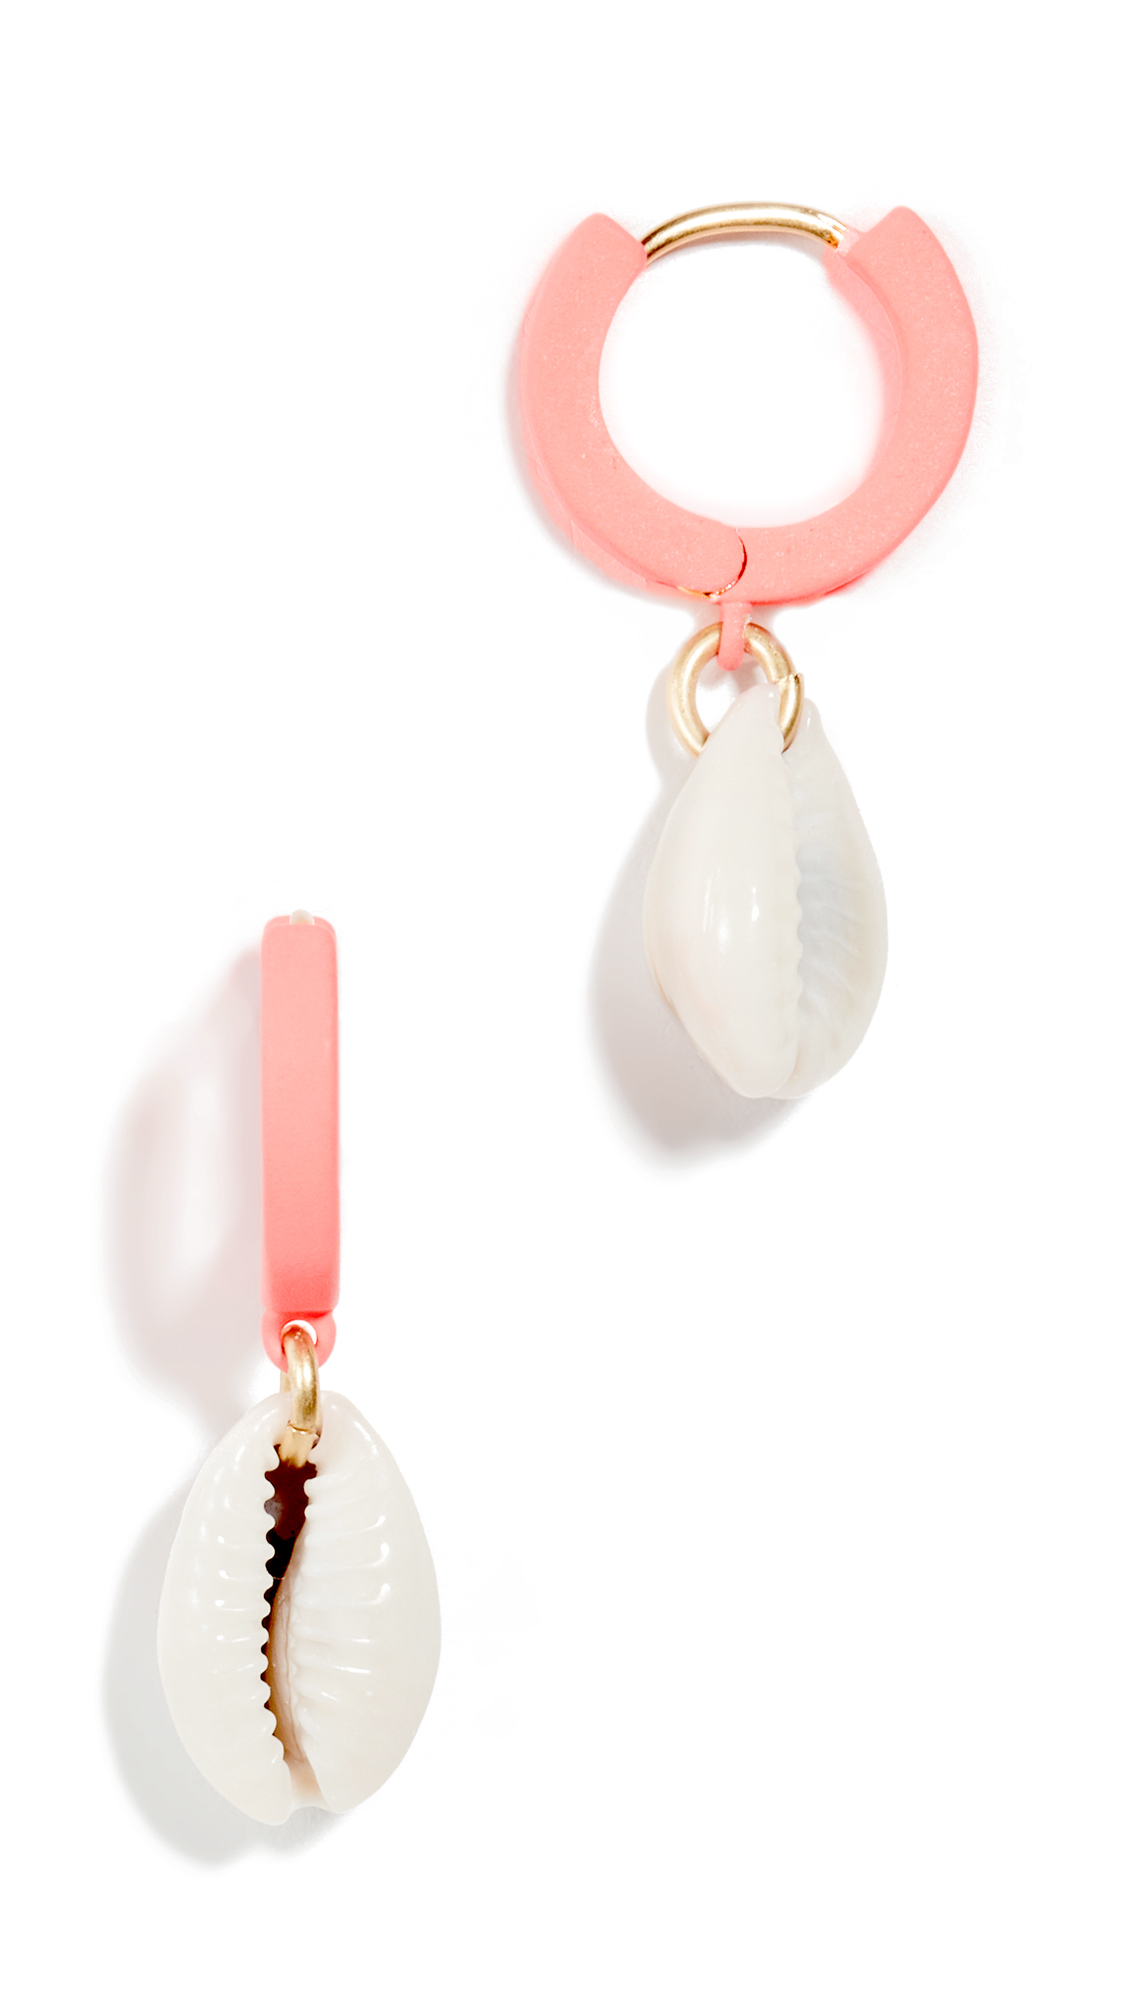 Madewell Cowrie Shell Charm Neon Hoop Earrings